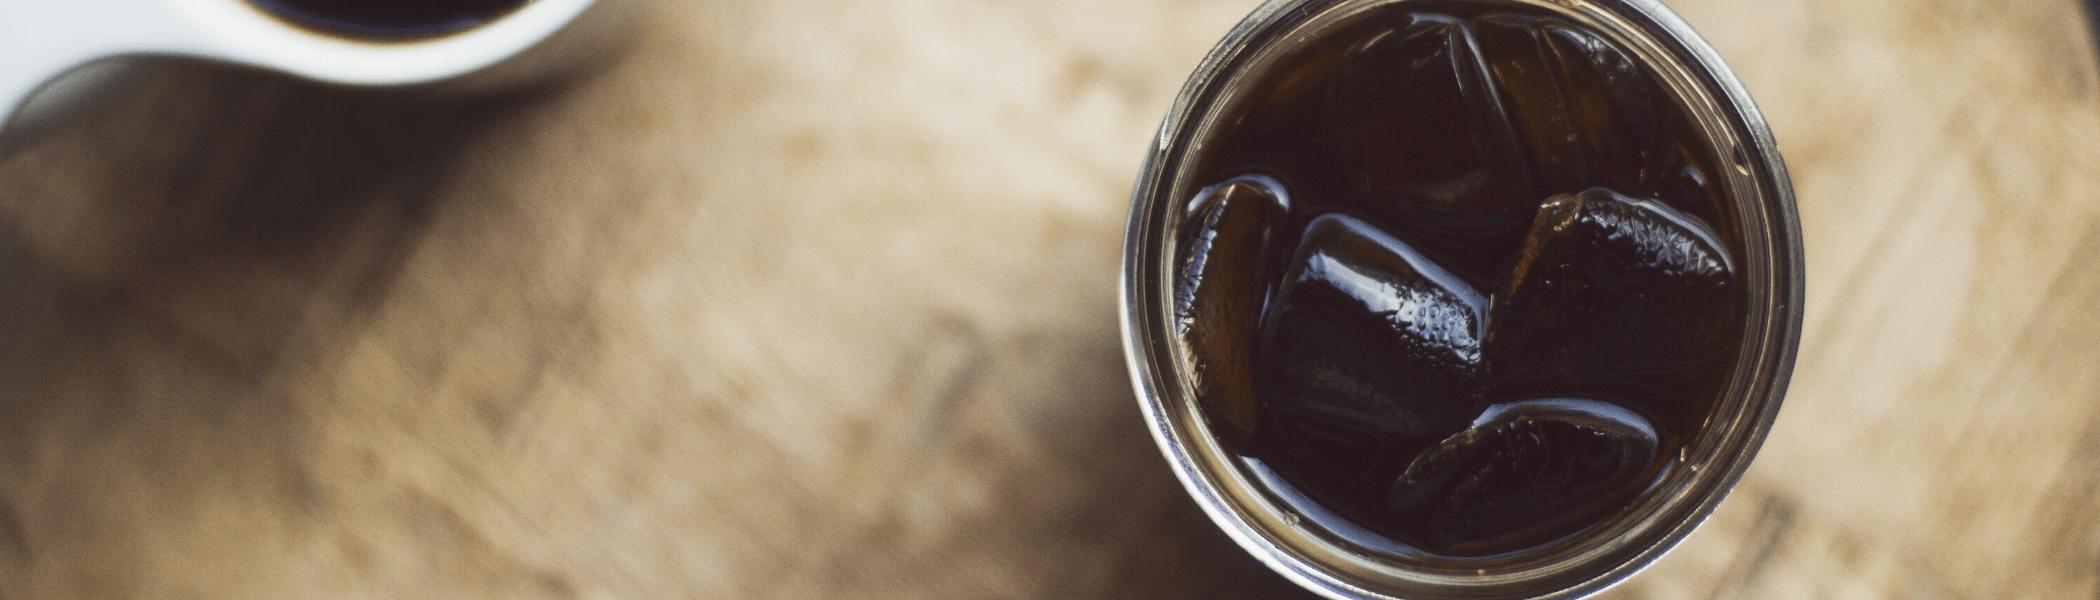 cup of cold espresso